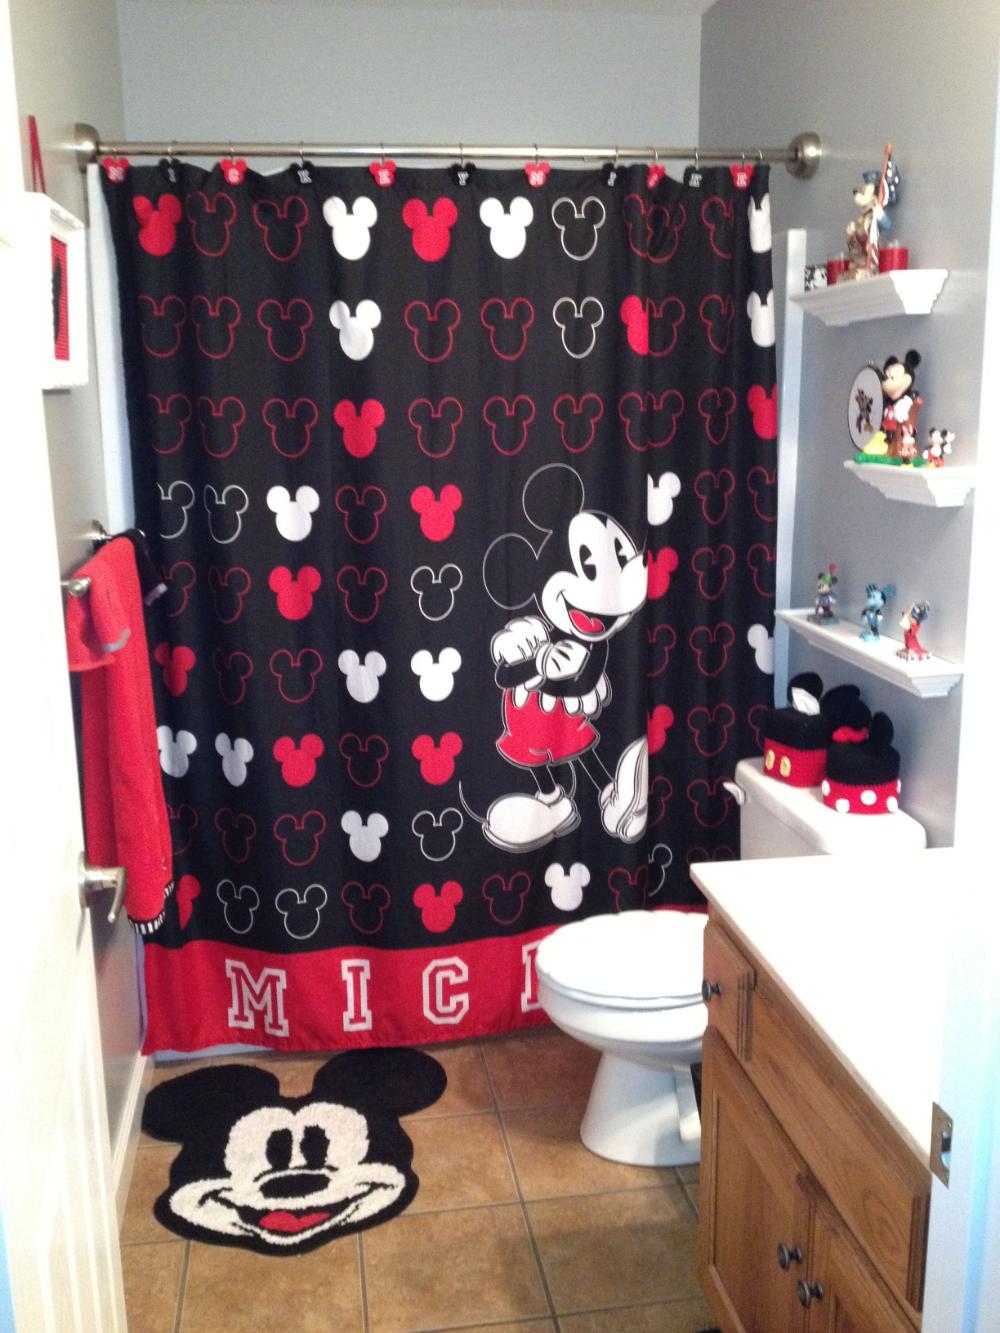 Disney Mickey Mouse Bathroom Decor In 2020 Mickey Mouse Bathroom